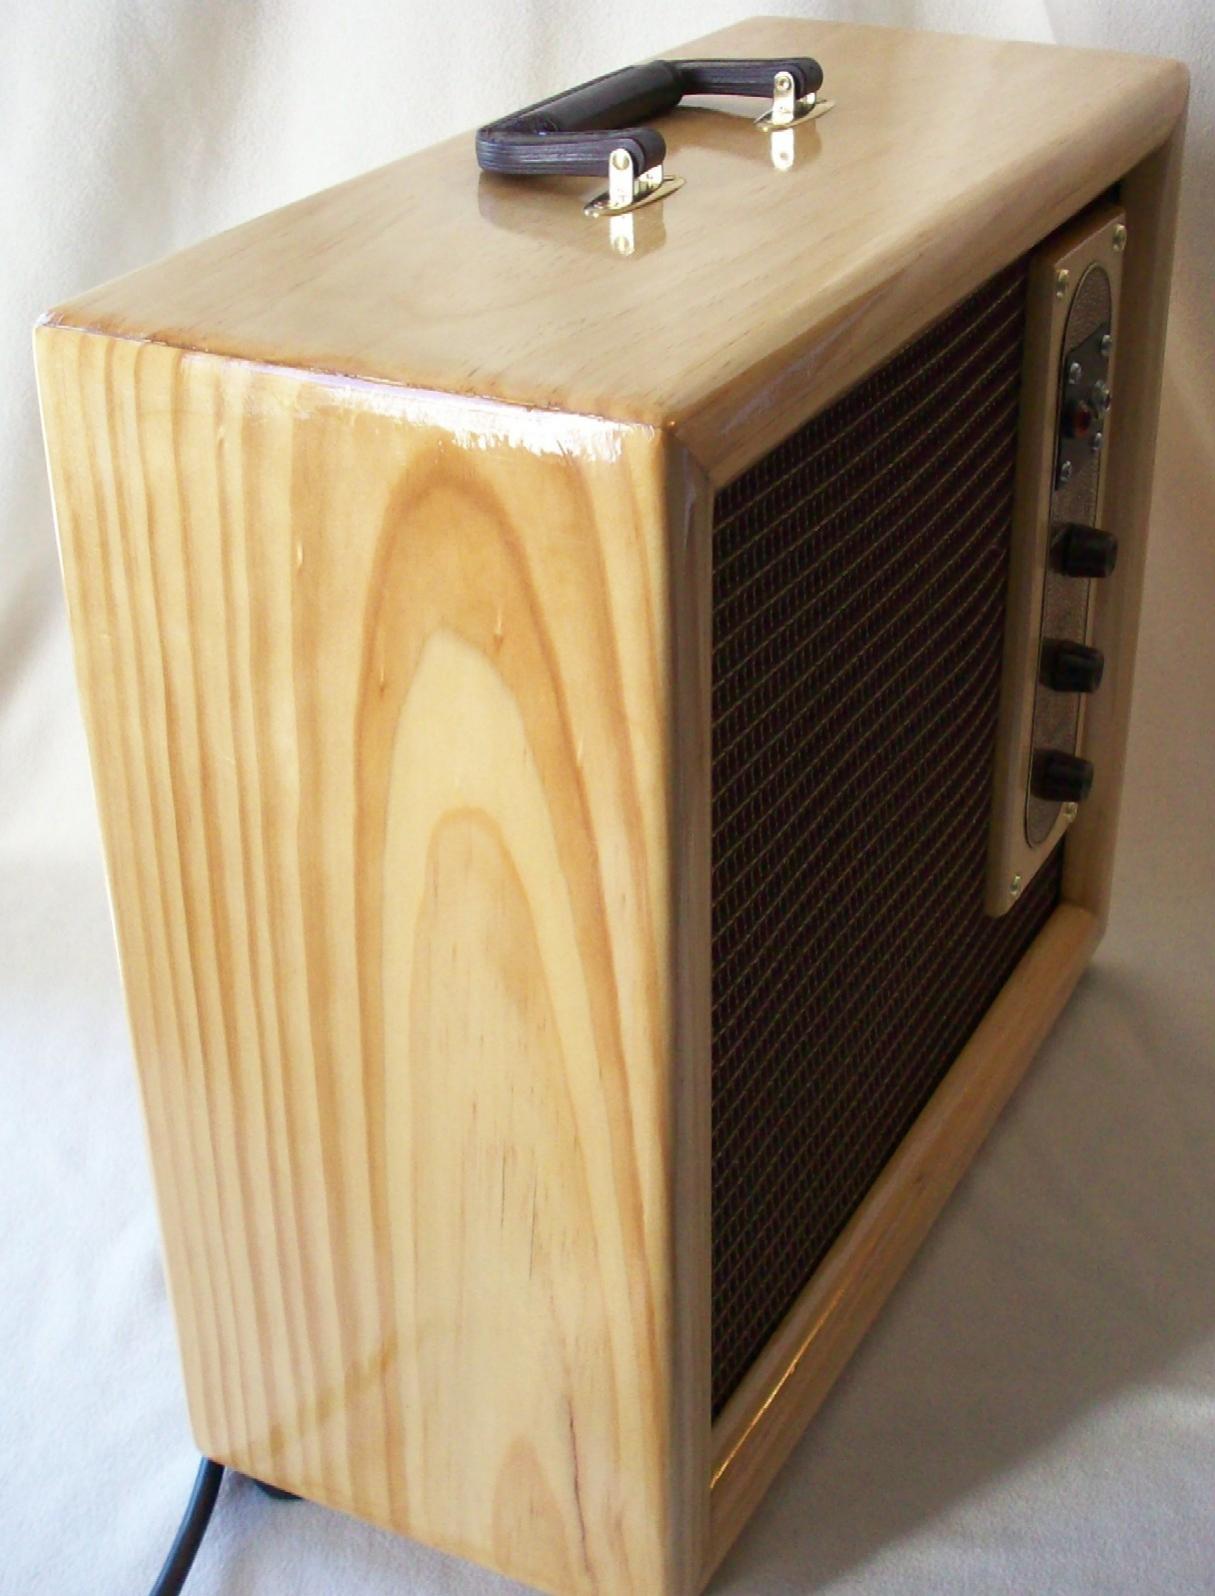 Anyone Ever Turn Old Tube Type Radios Into Something Cool Gearslutz. Ebay Anyone Ever Turn Old Tube Type Radios Into Something Cool. Wiring. Zenith Radio Schematics Model C730 At Scoala.co